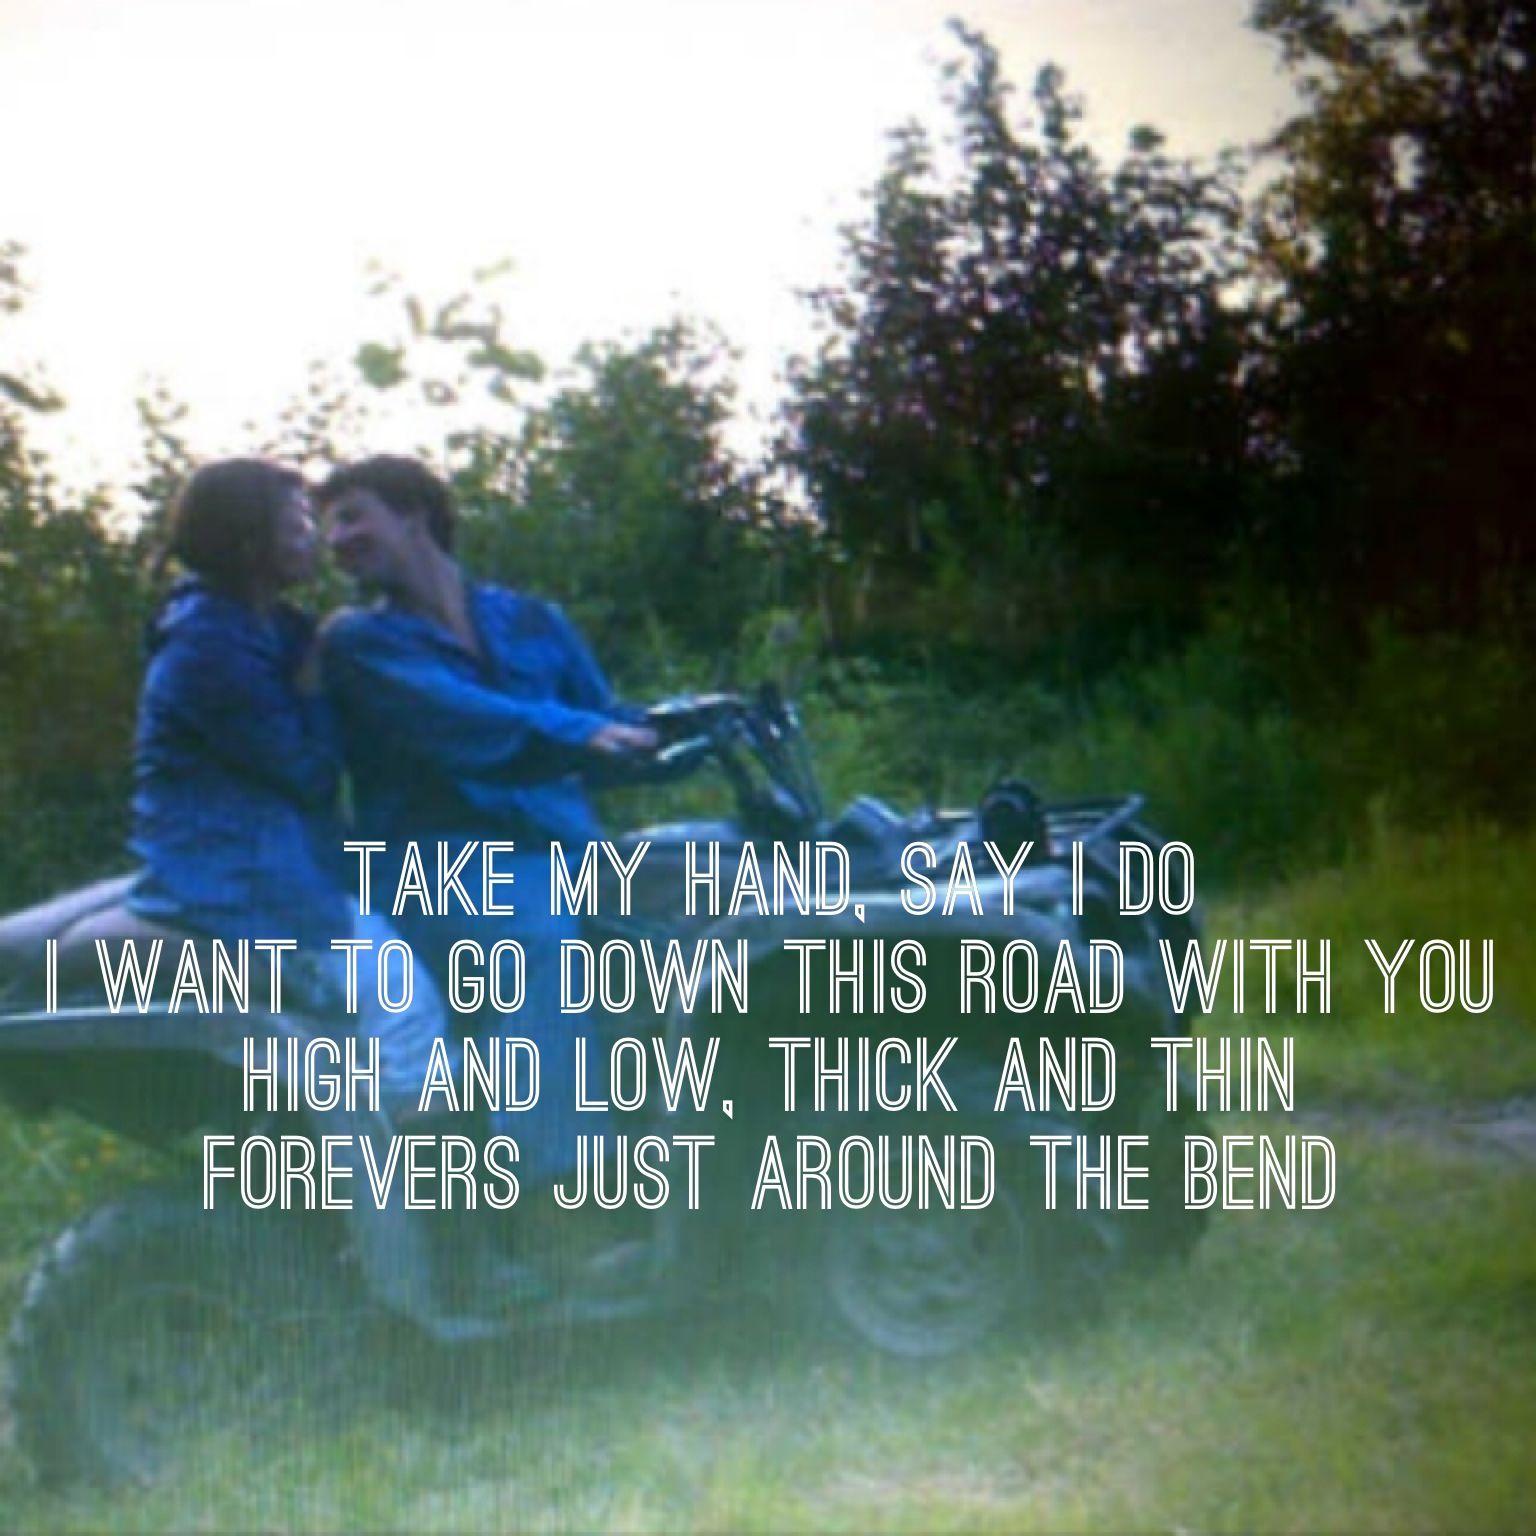 Riding high lyrics